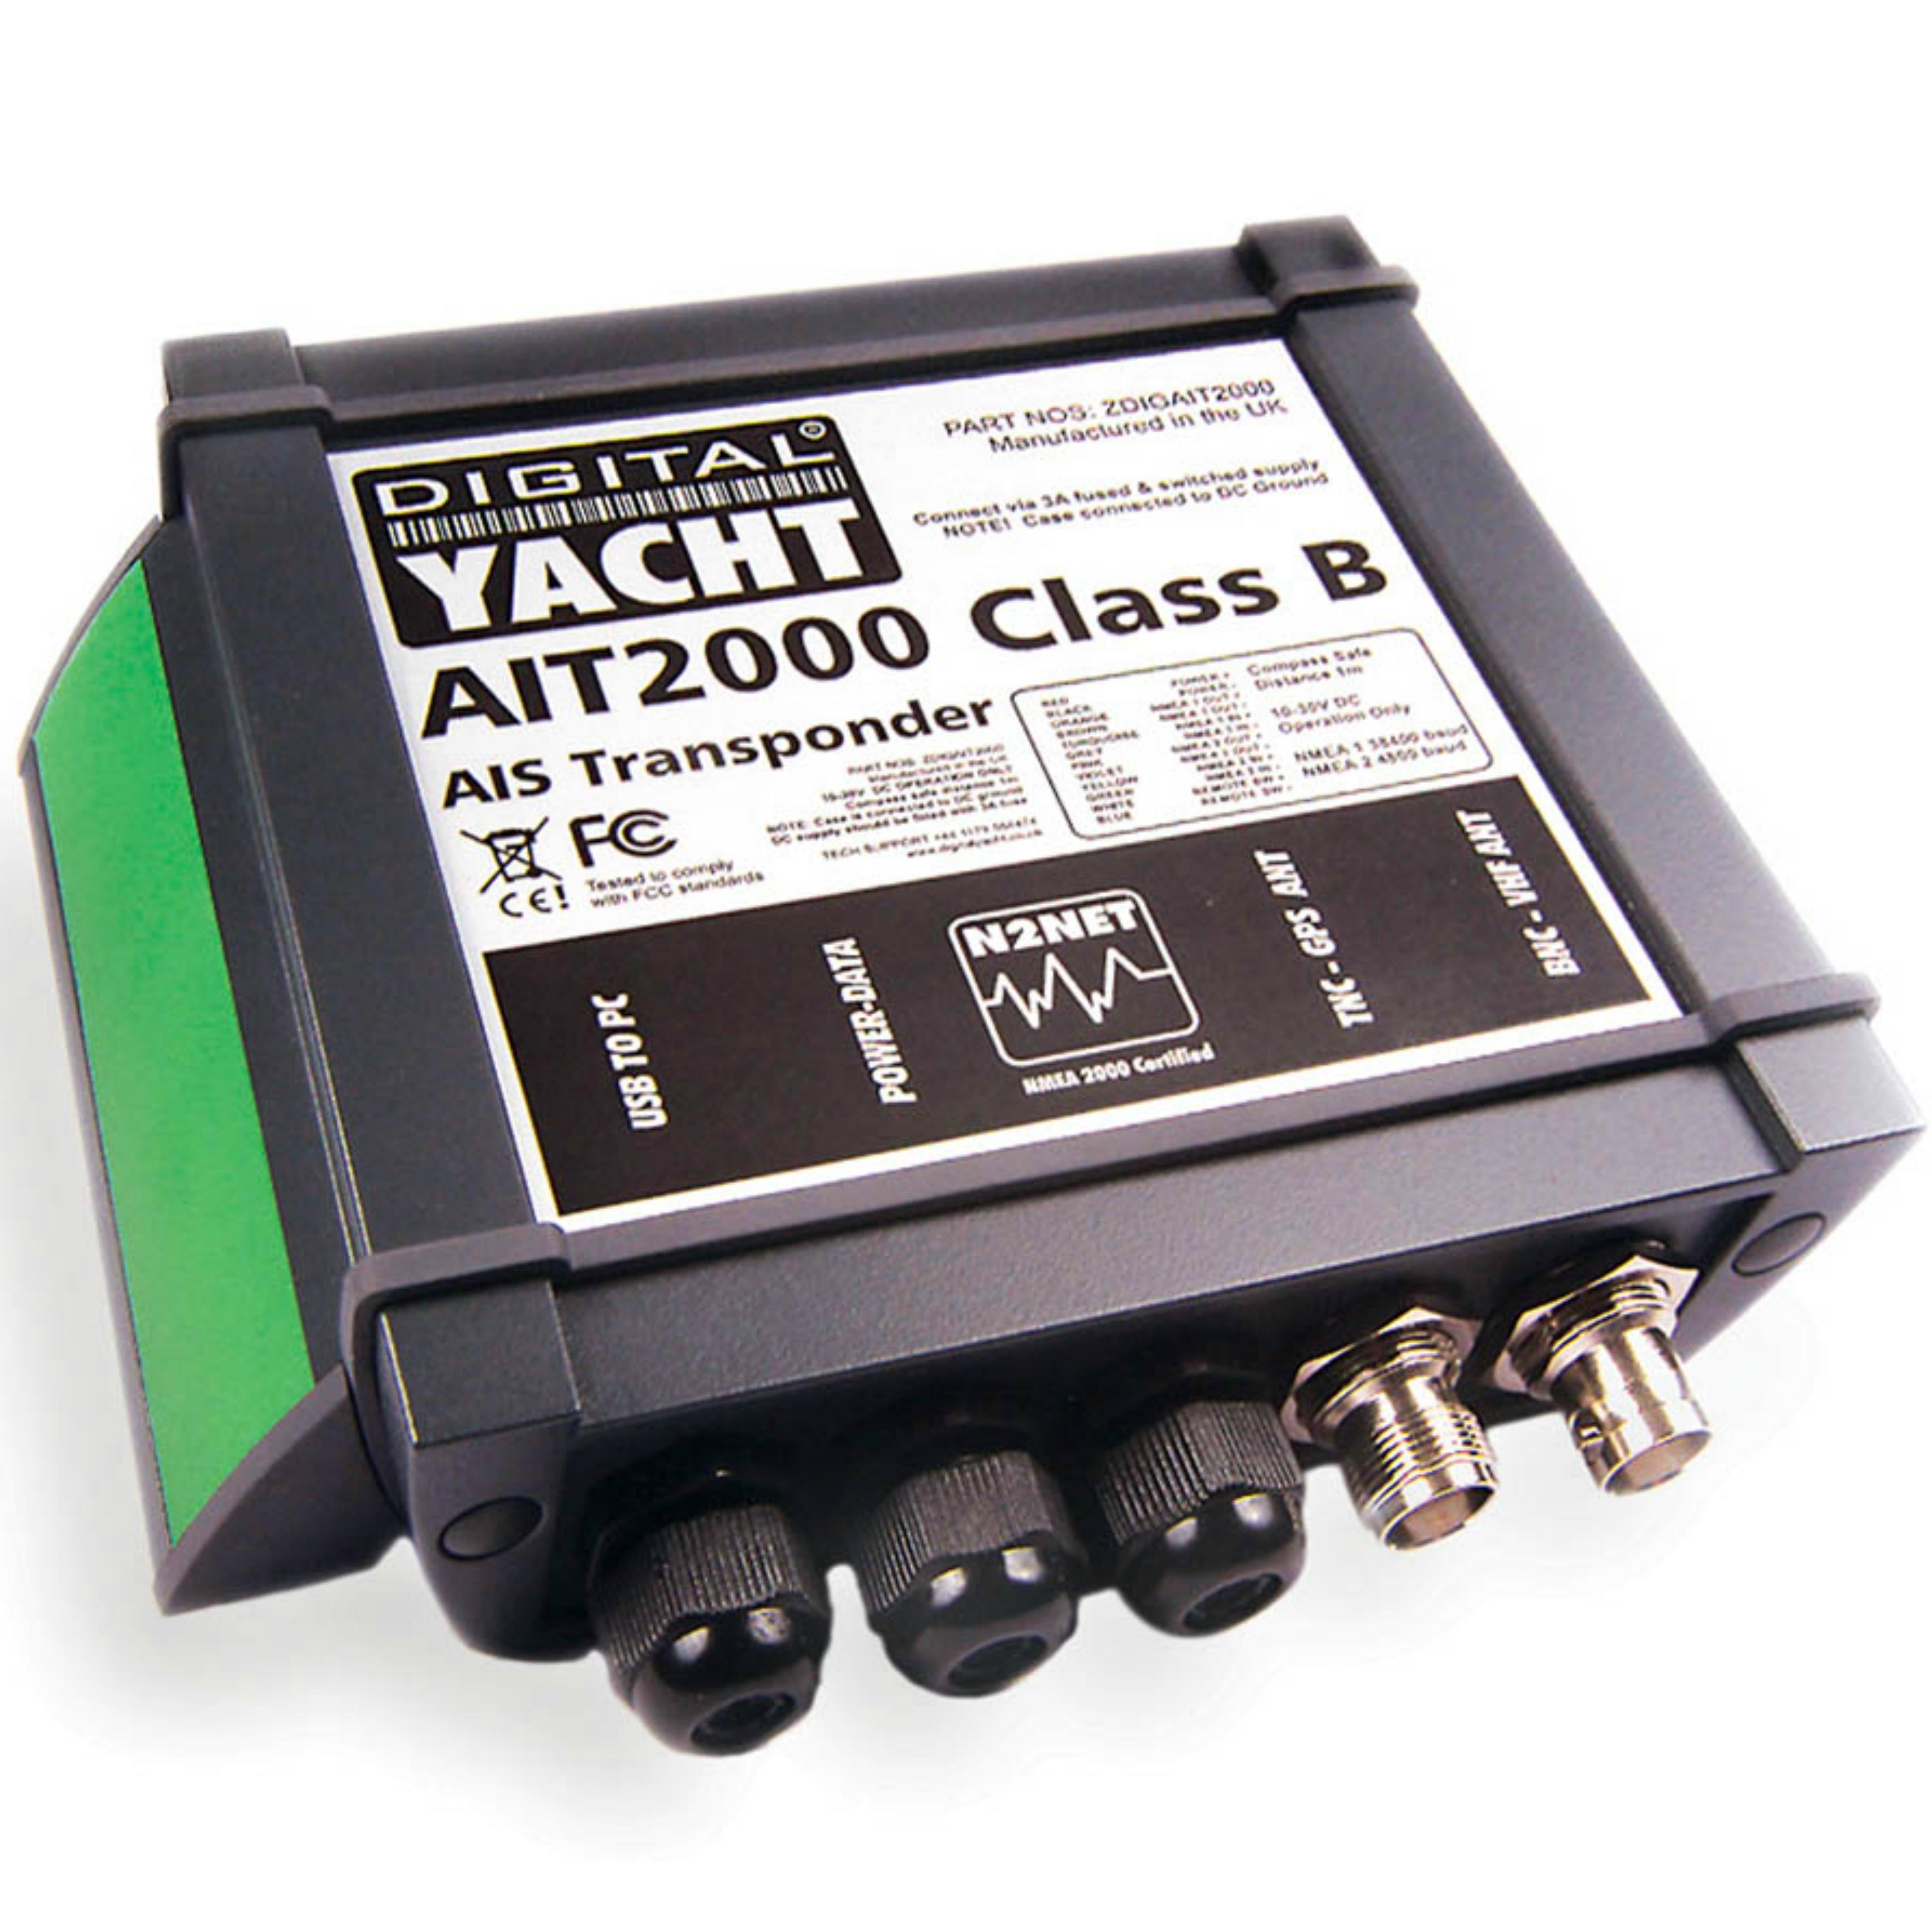 Digital Yacht-AIT2000|Class B AIS Transponde w/GPS Antenna|High Speed|Connect PC & MAC